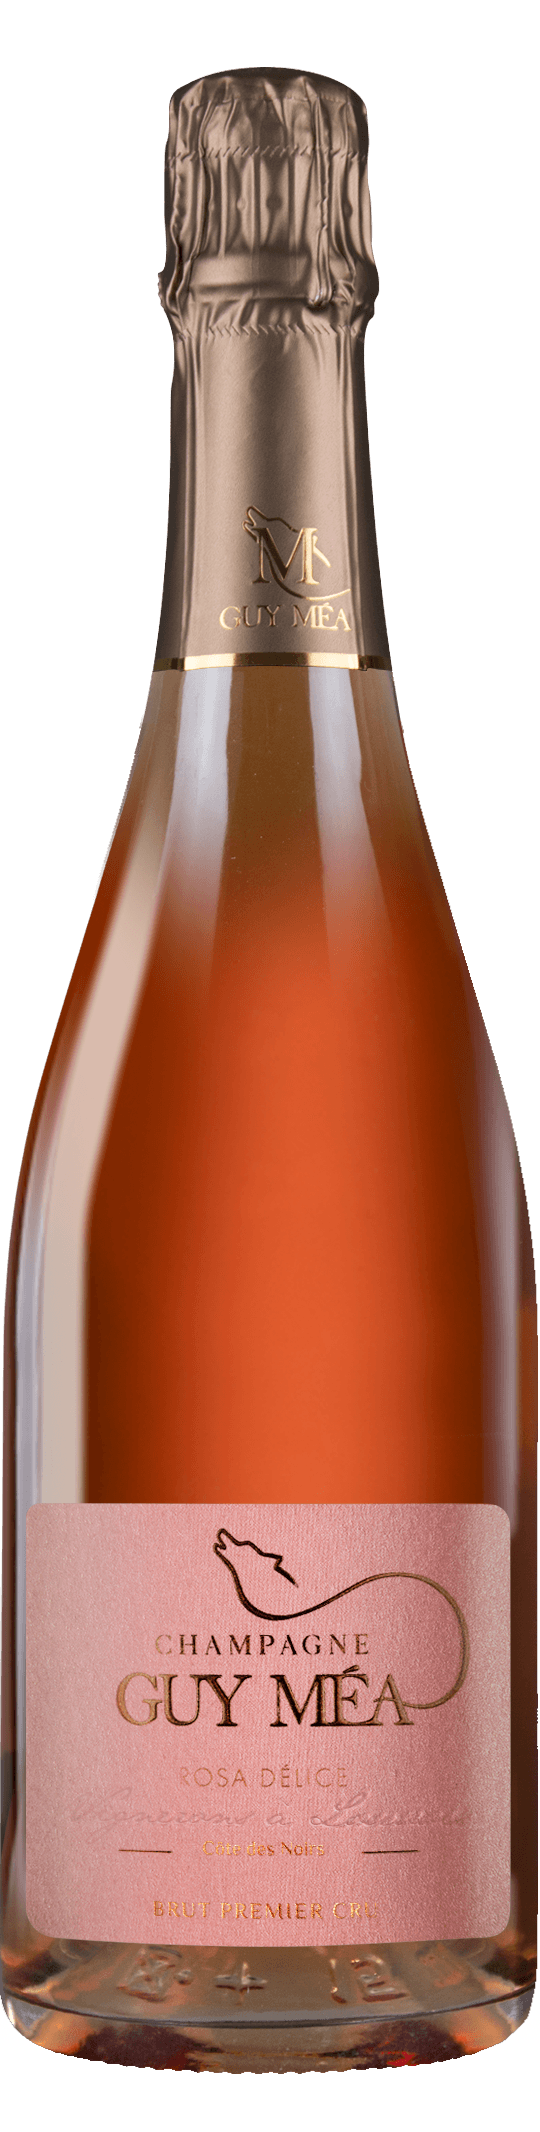 Rosa Délice - Champagne Guy Mea